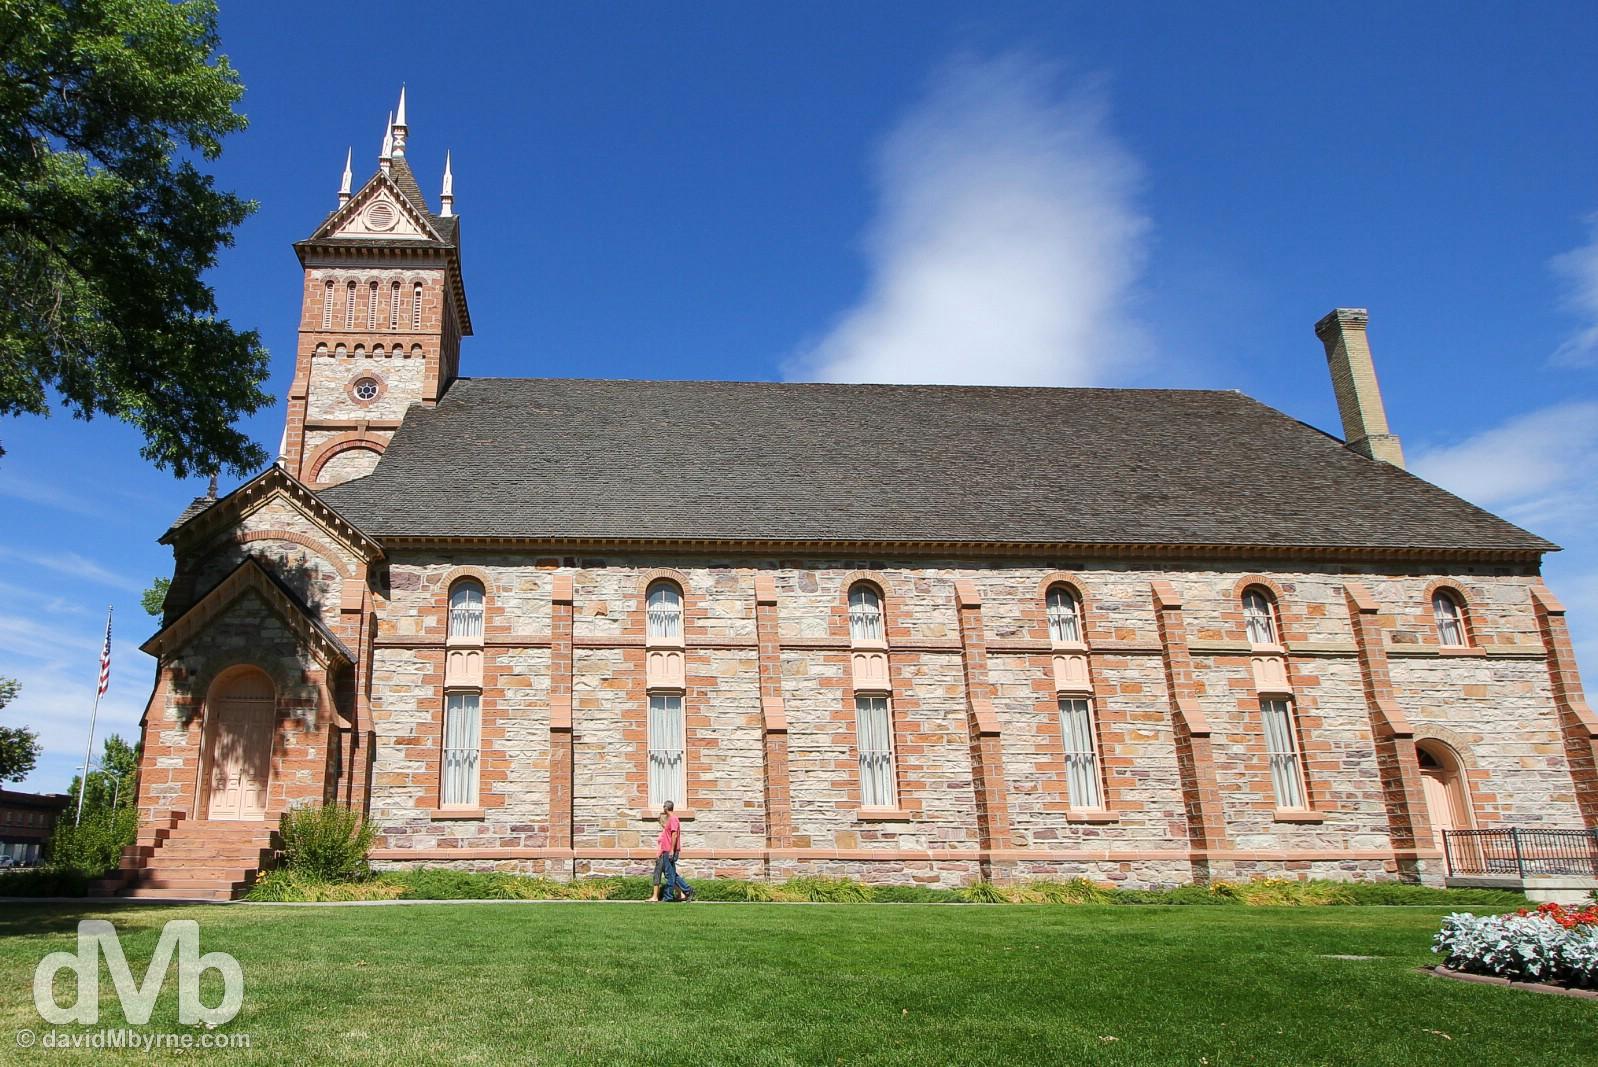 The Romanesque 1880s Tabernacle in Paris, Idaho, USA. September 6, 2016.